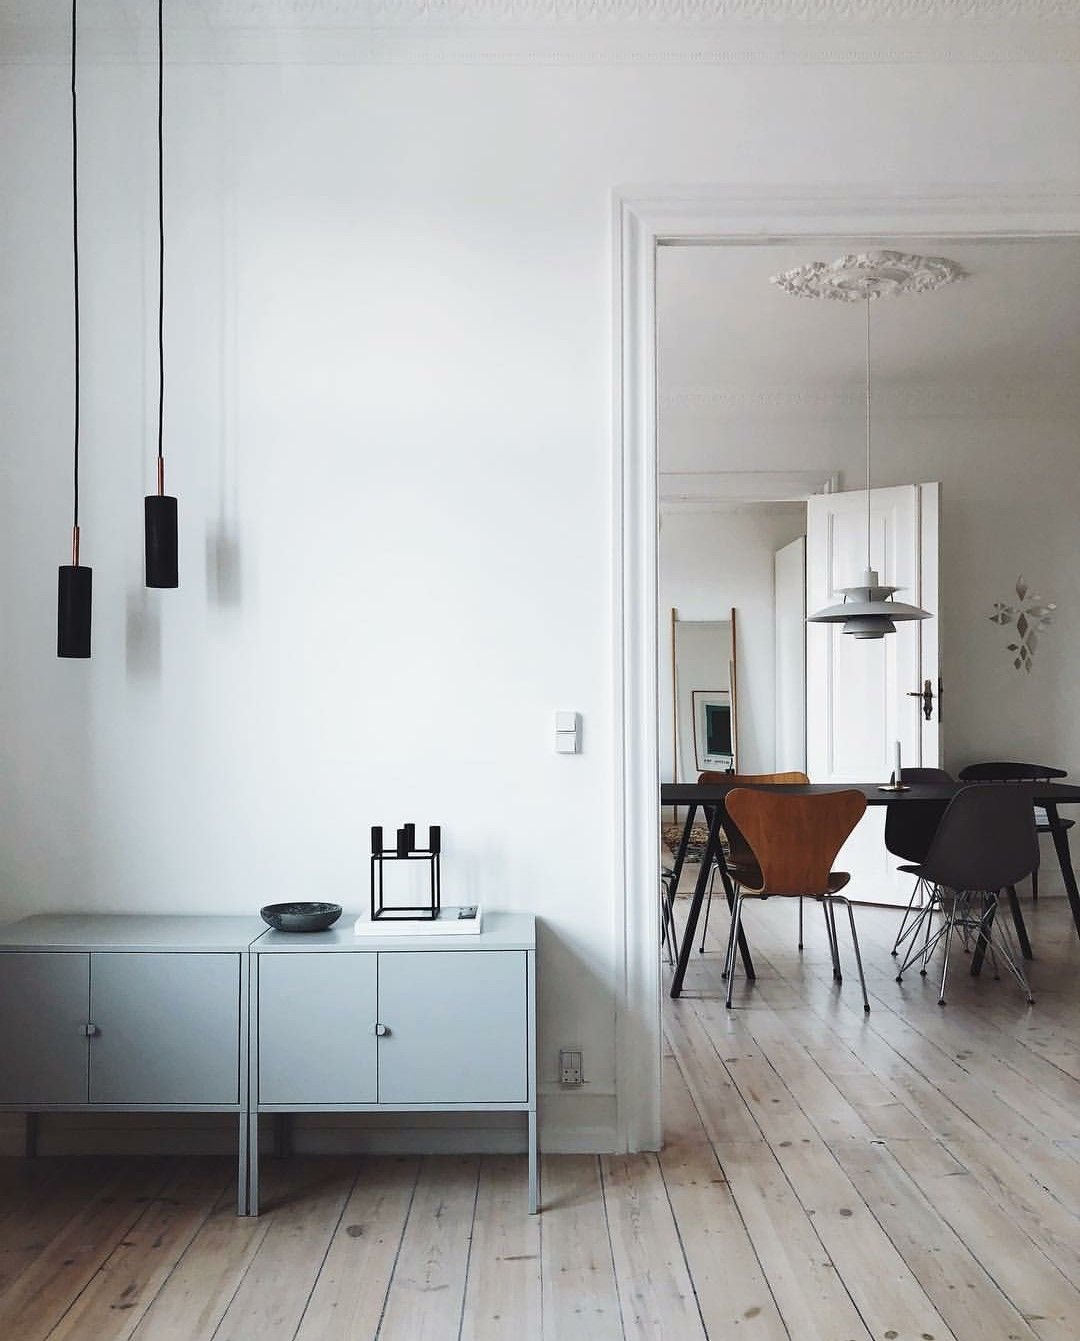 By Pernille Baastrup. IKEA sideboard, epj pendant lamps